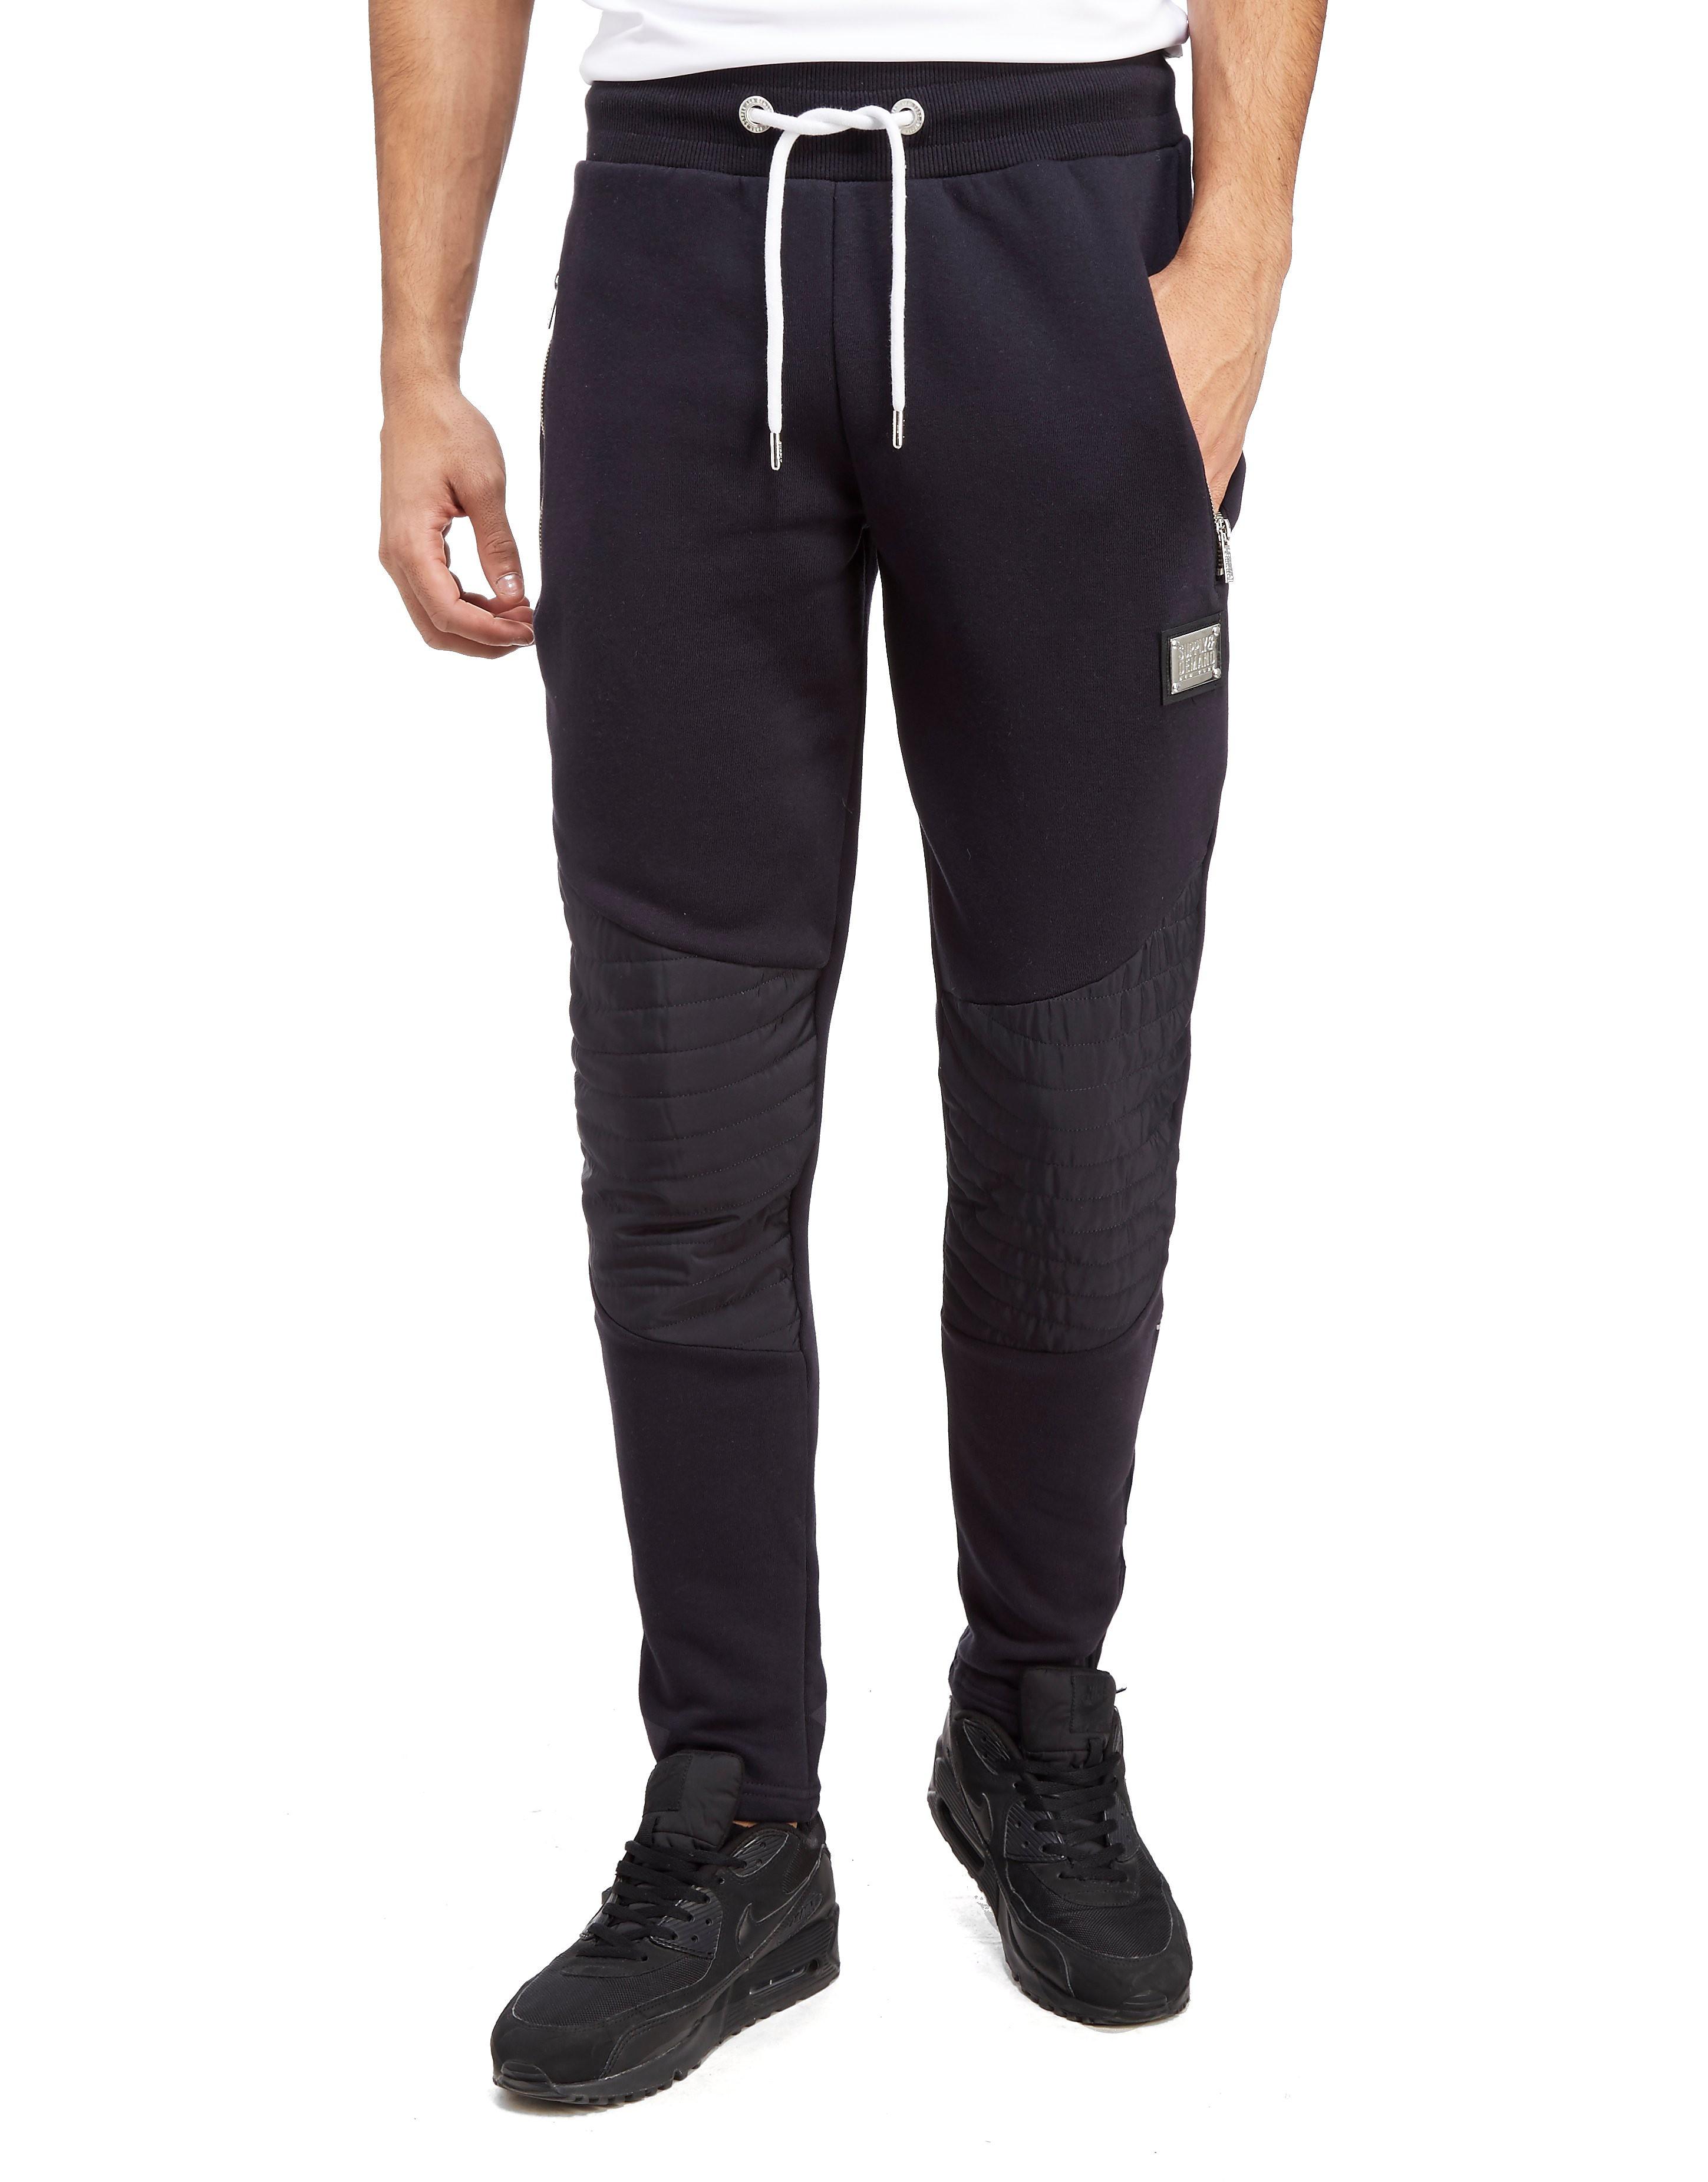 Supply & Demand Pantalones para correr Atomic